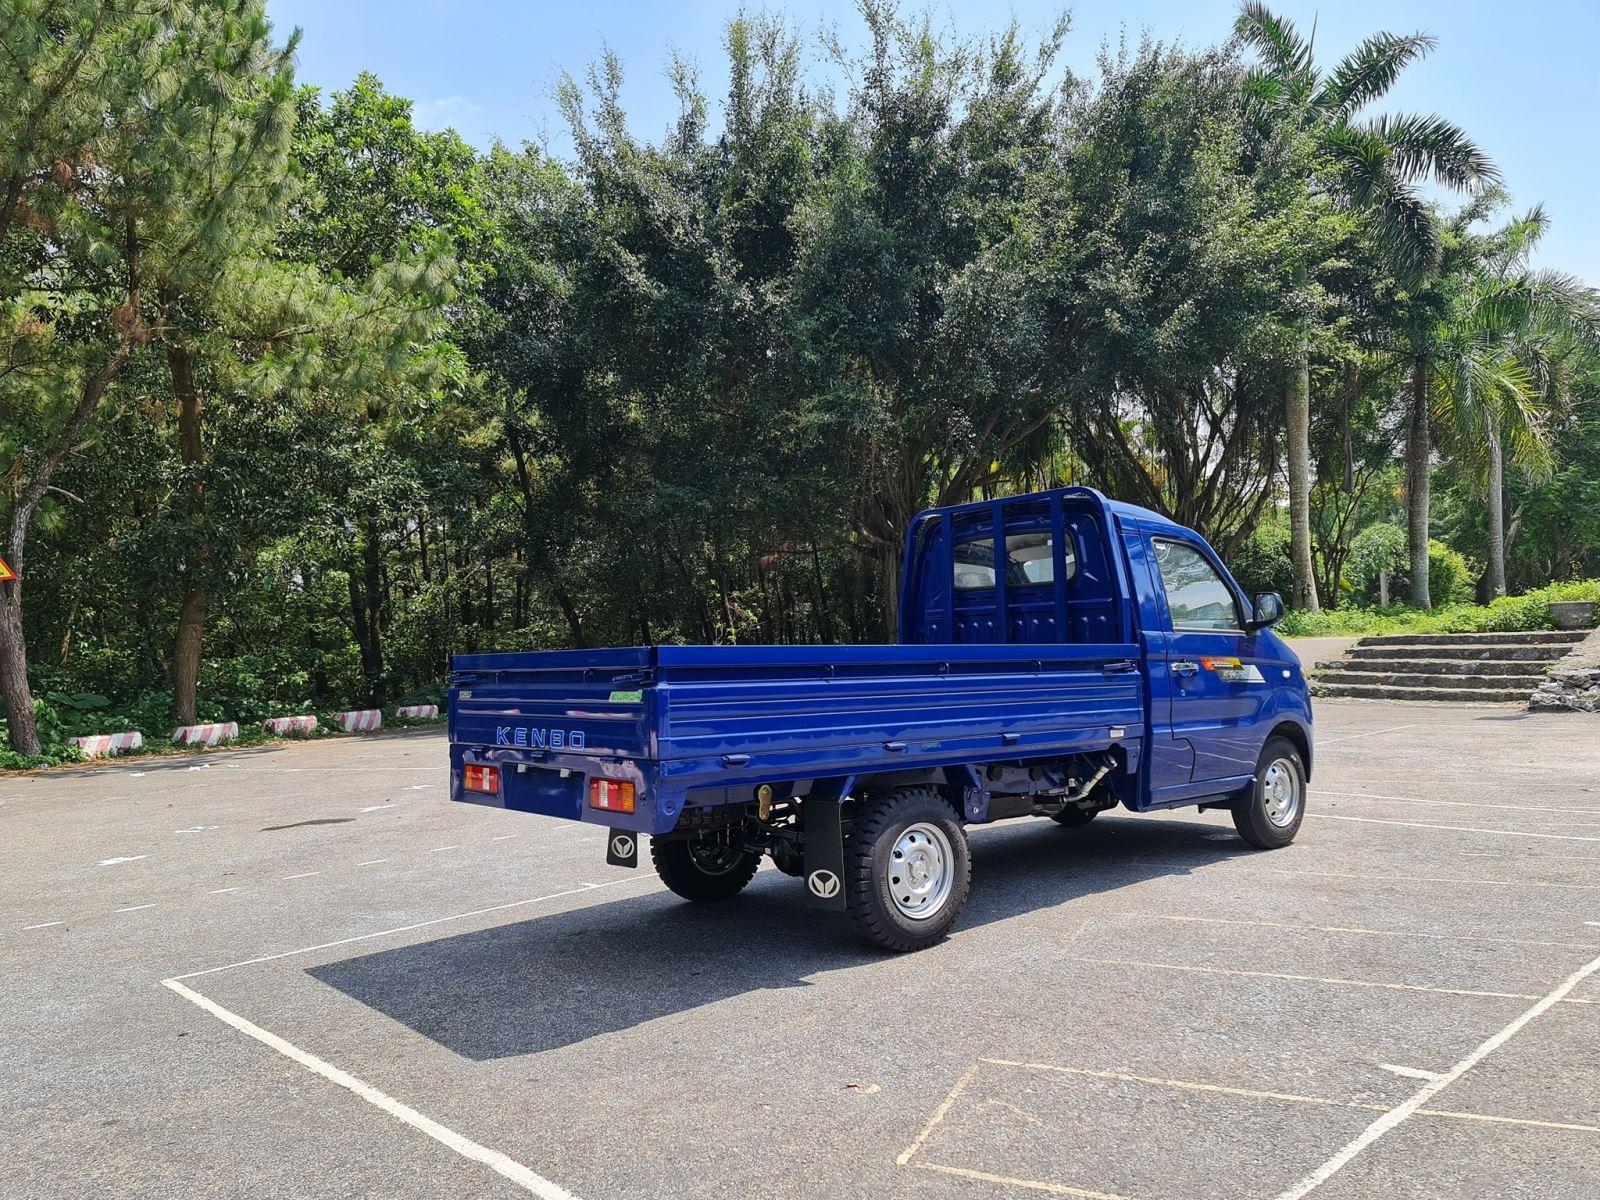 Xe tải kenbo thùng lửng 995kg, Xe tải kenbo thùng lửng, Xe tải kenbo, ô tô kenbo